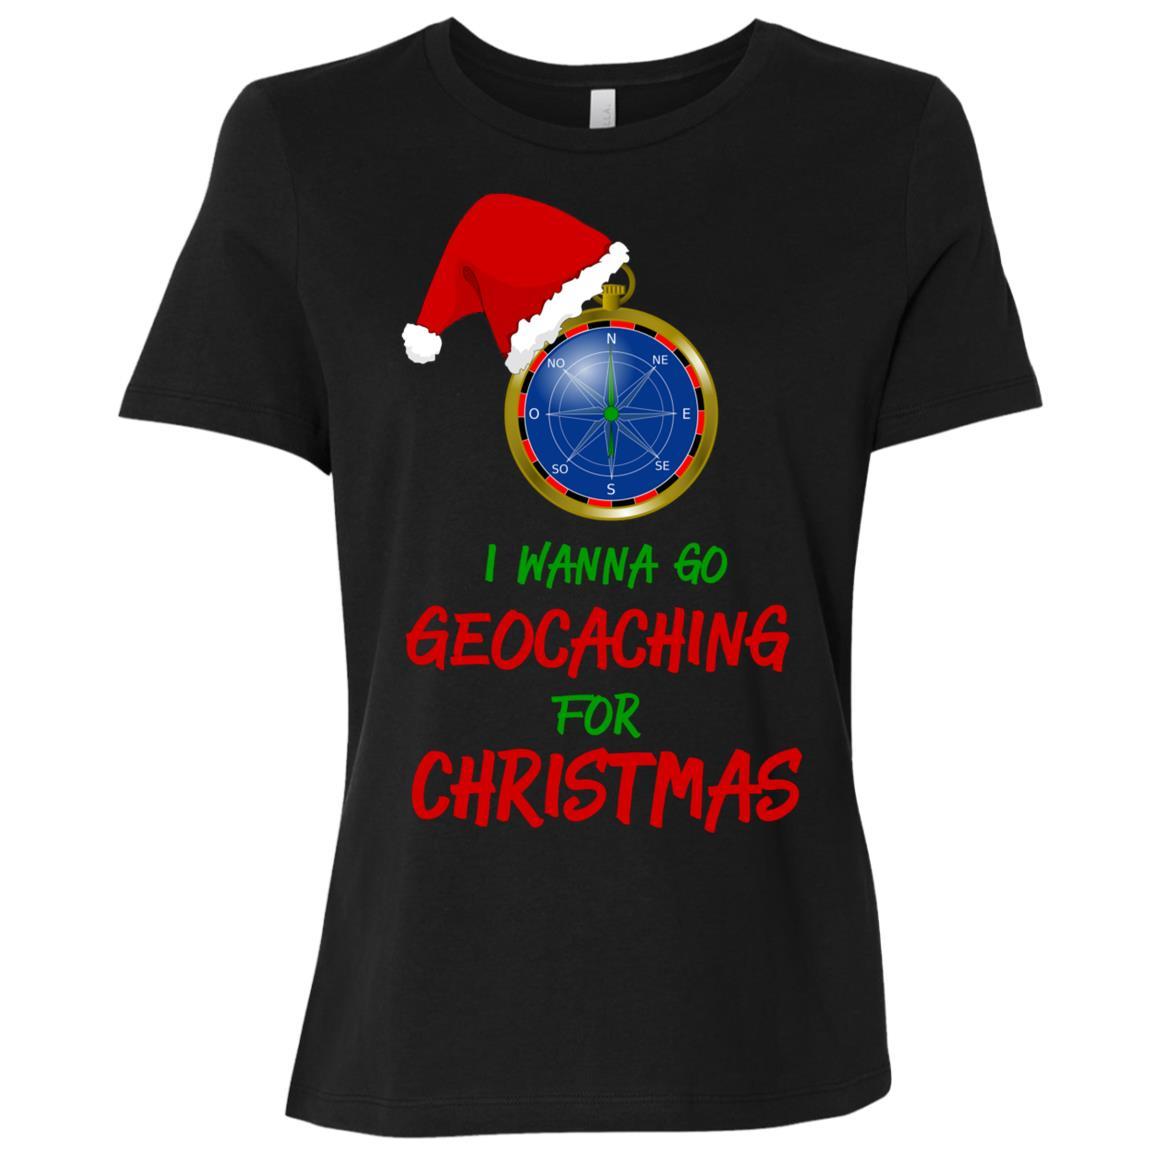 I Wanna Go Geocaching For Christmas Treasure Hunt Fun-1 Women Short Sleeve T-Shirt